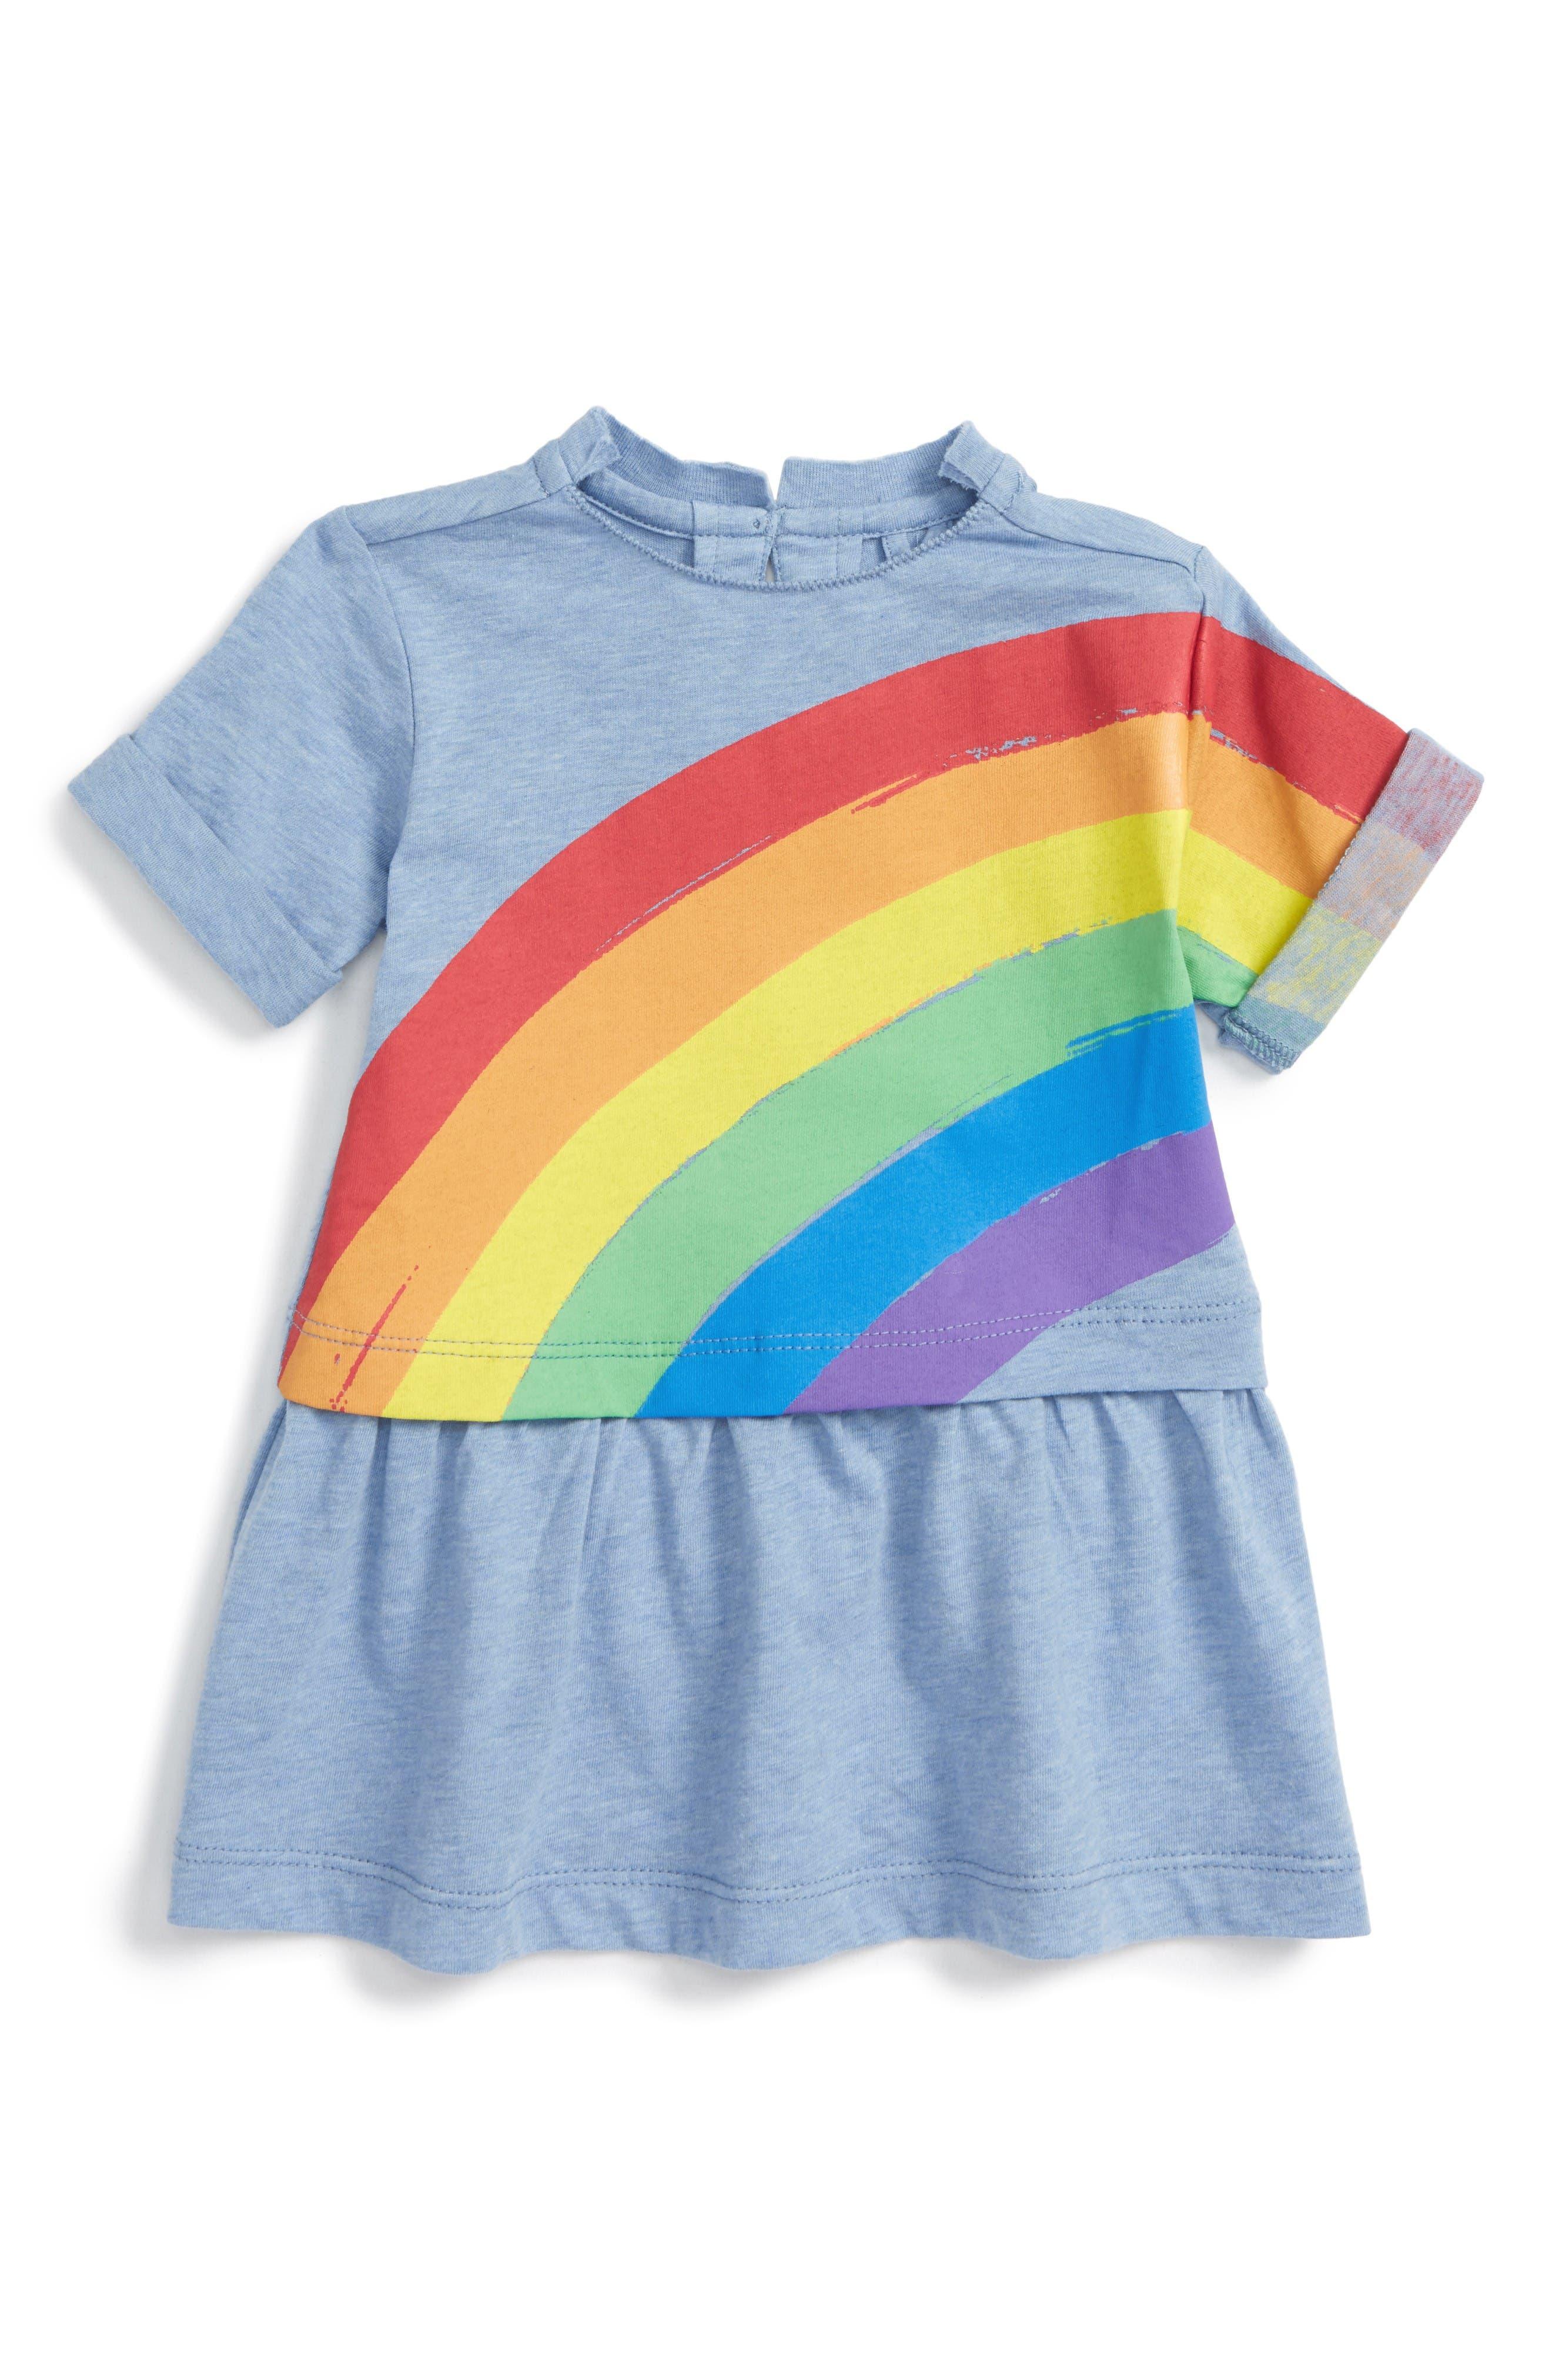 Stella McCartney Kids Jess Rainbow Dress (Baby Girls)